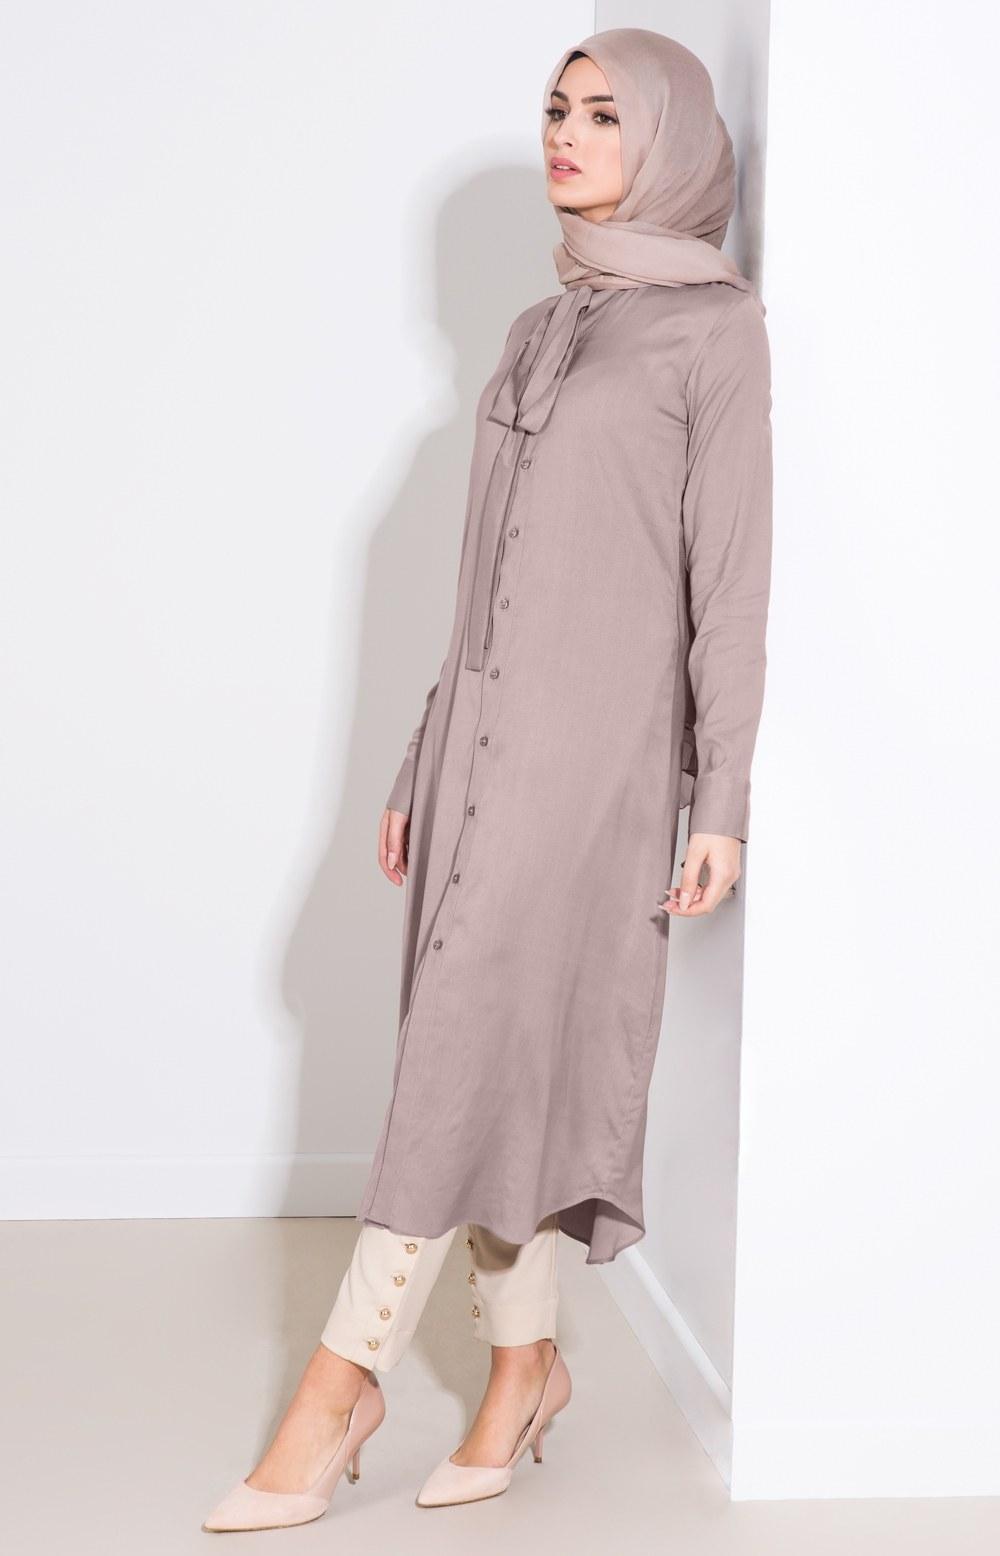 Design Baju Lebaran Wanita E6d5 25 Trend Model Baju Muslim Lebaran 2018 Simple & Modis